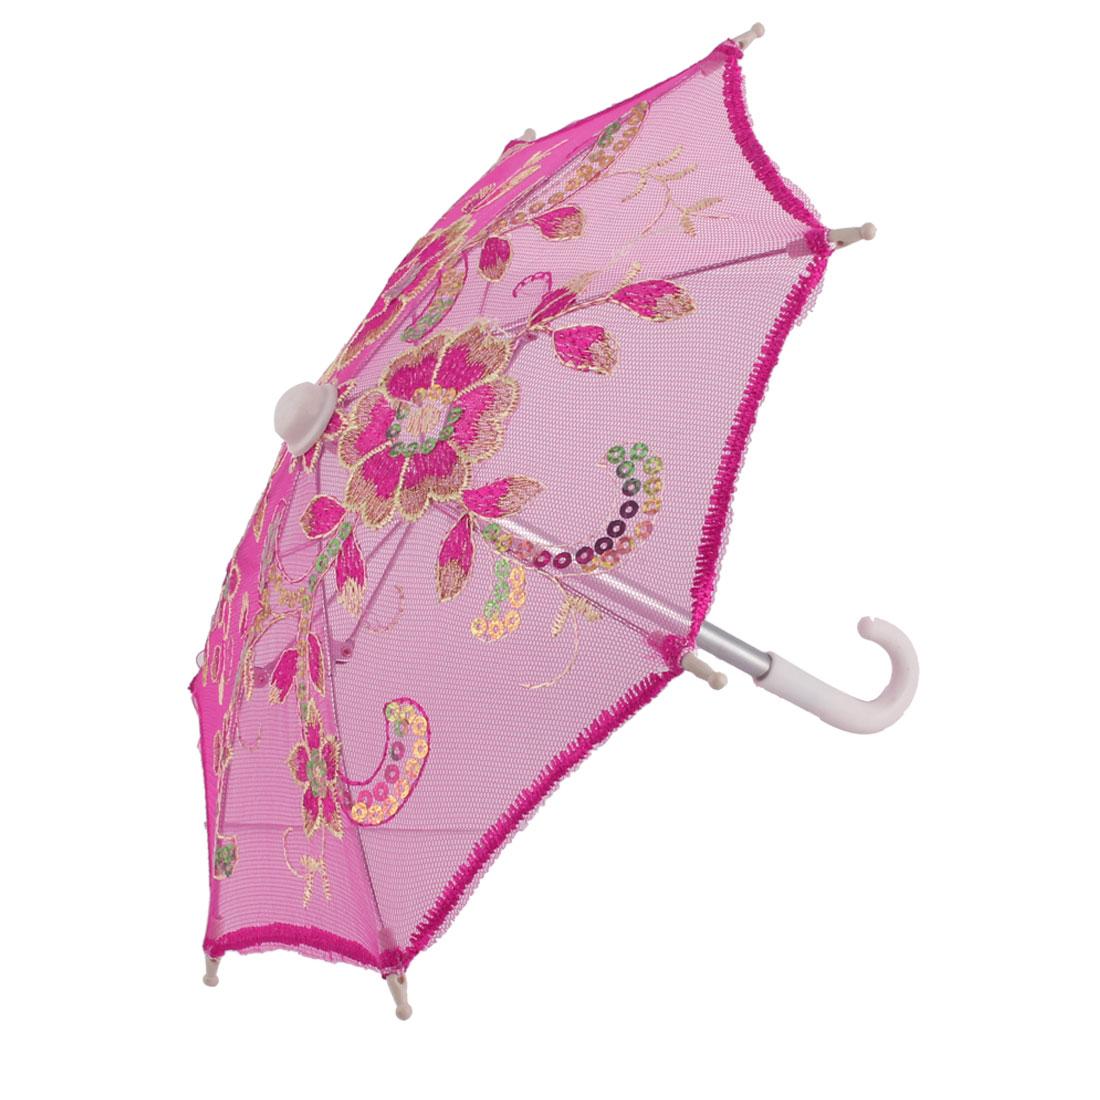 Festival Lace Flower Pattern Embroidered Sequin Decor Handle Folding Mini Umbrella